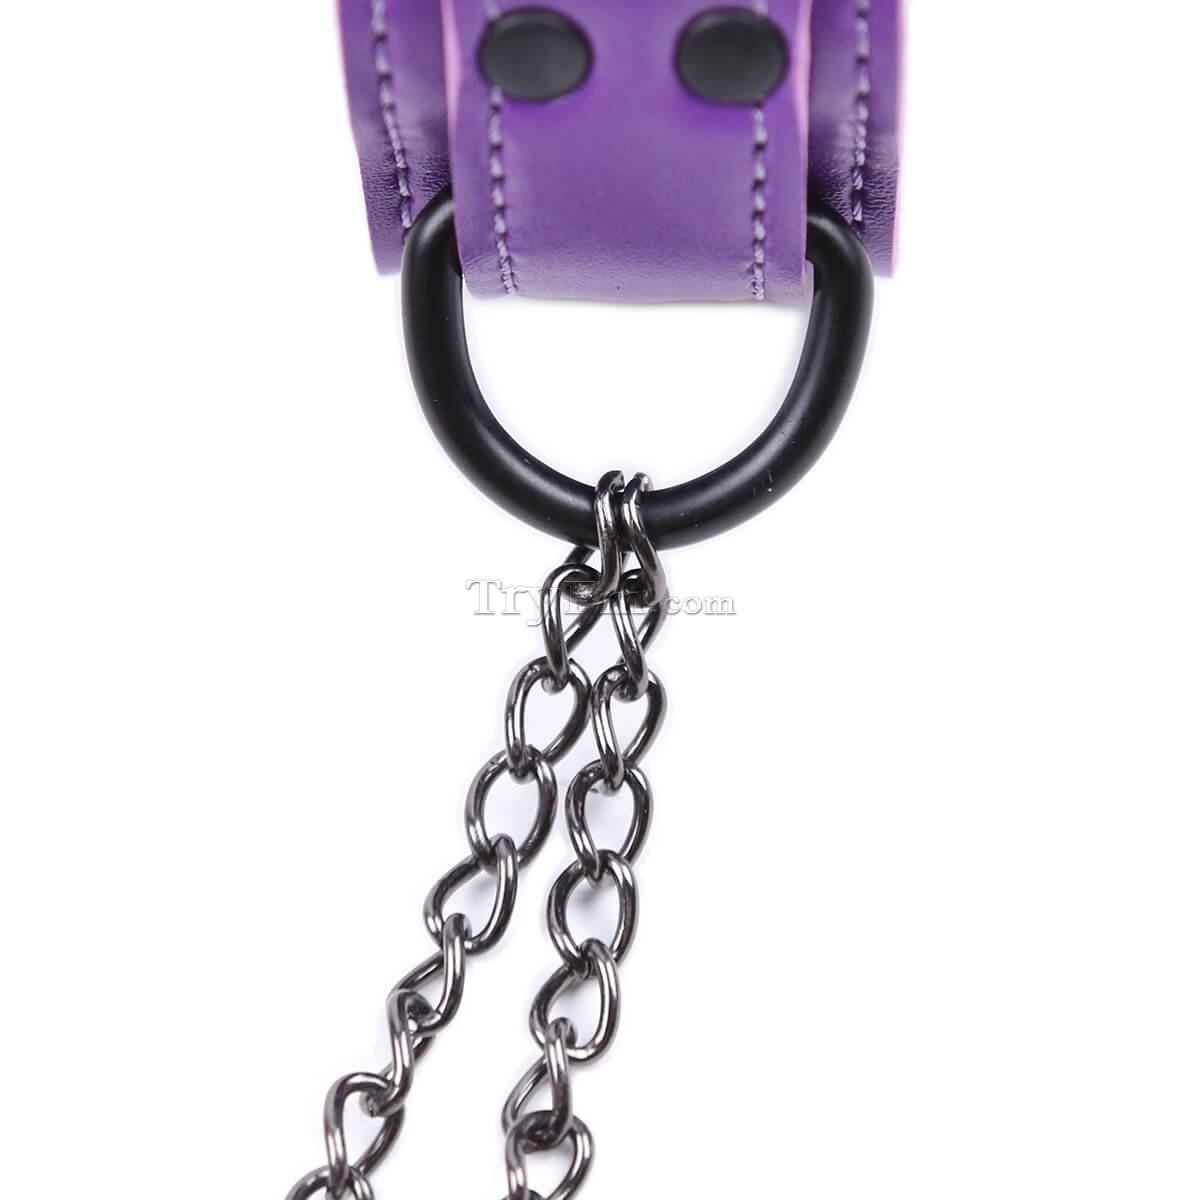 16-sex-slave-collar5.jpg